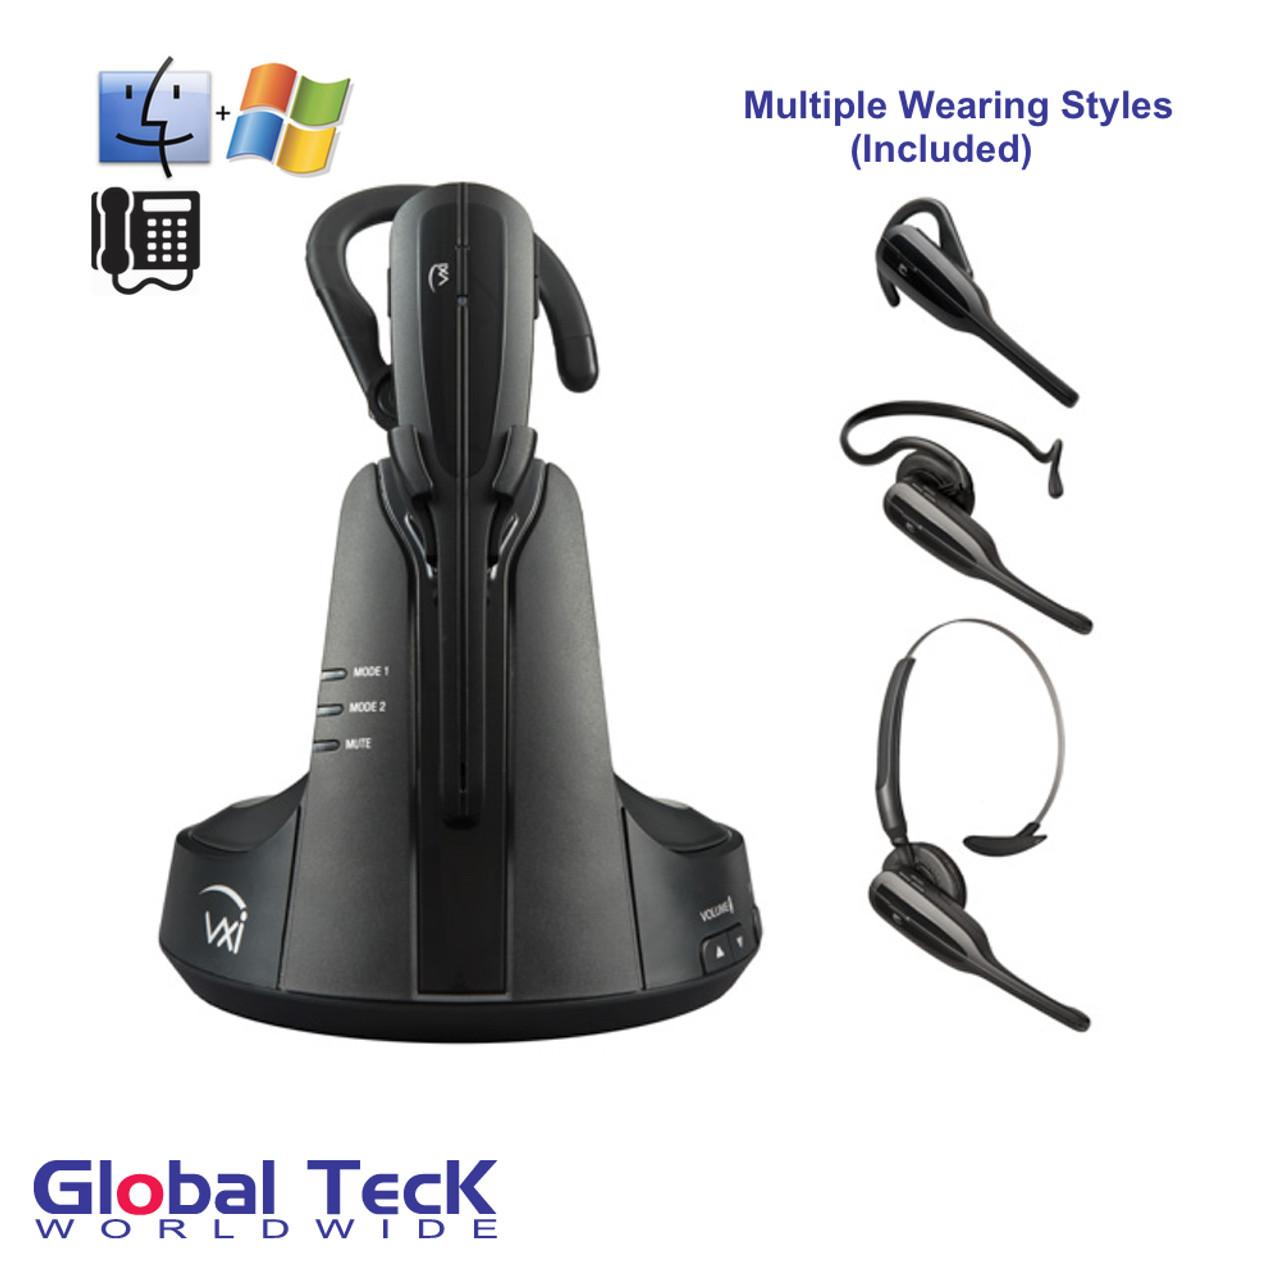 203940 VXi V200 Wireless Headset System